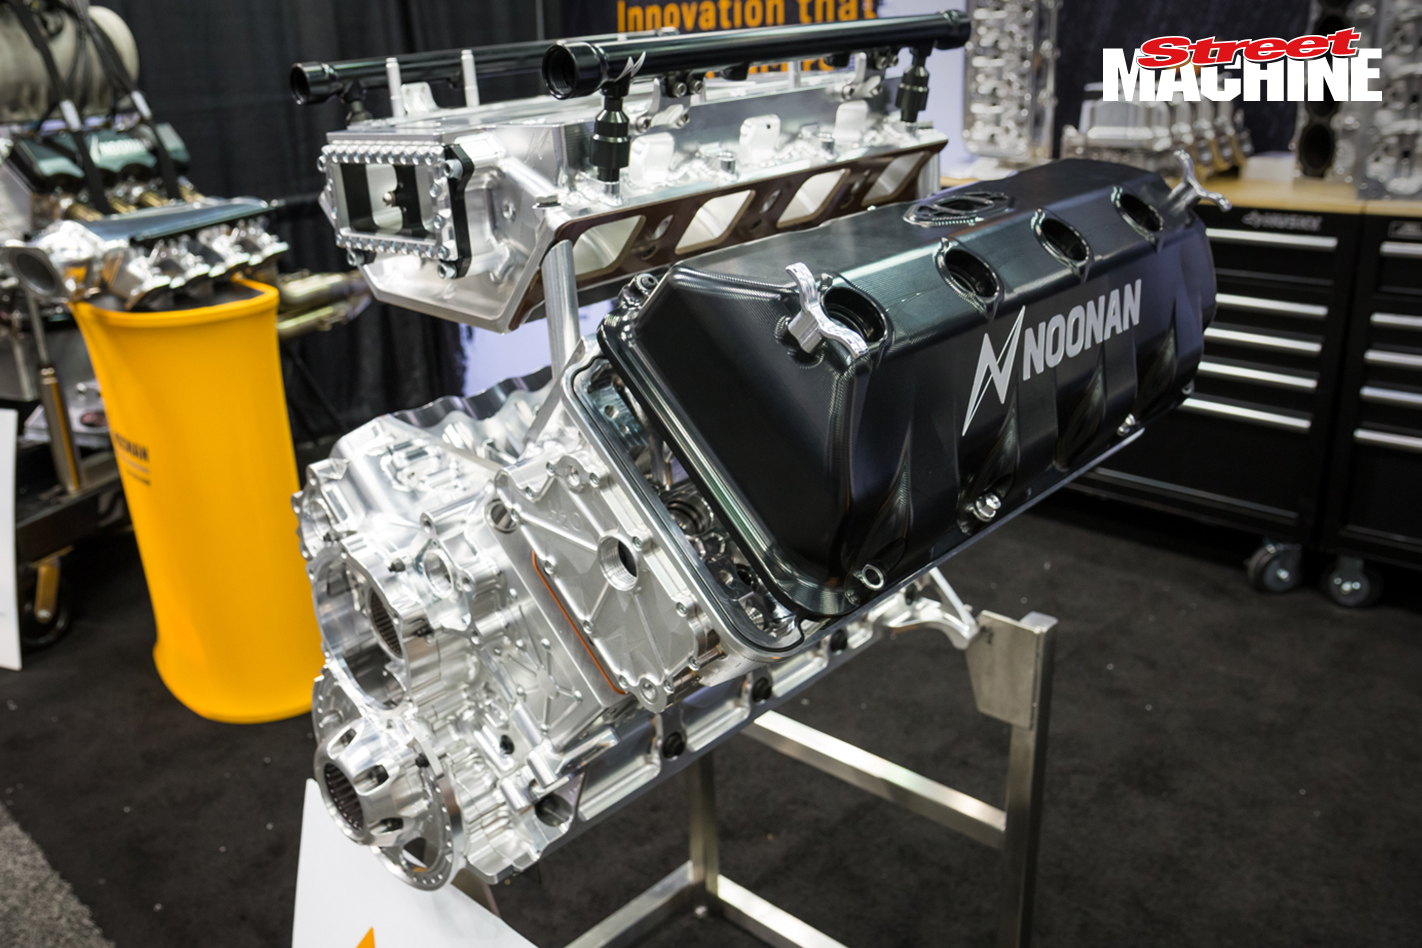 Noonan Hemi Engine